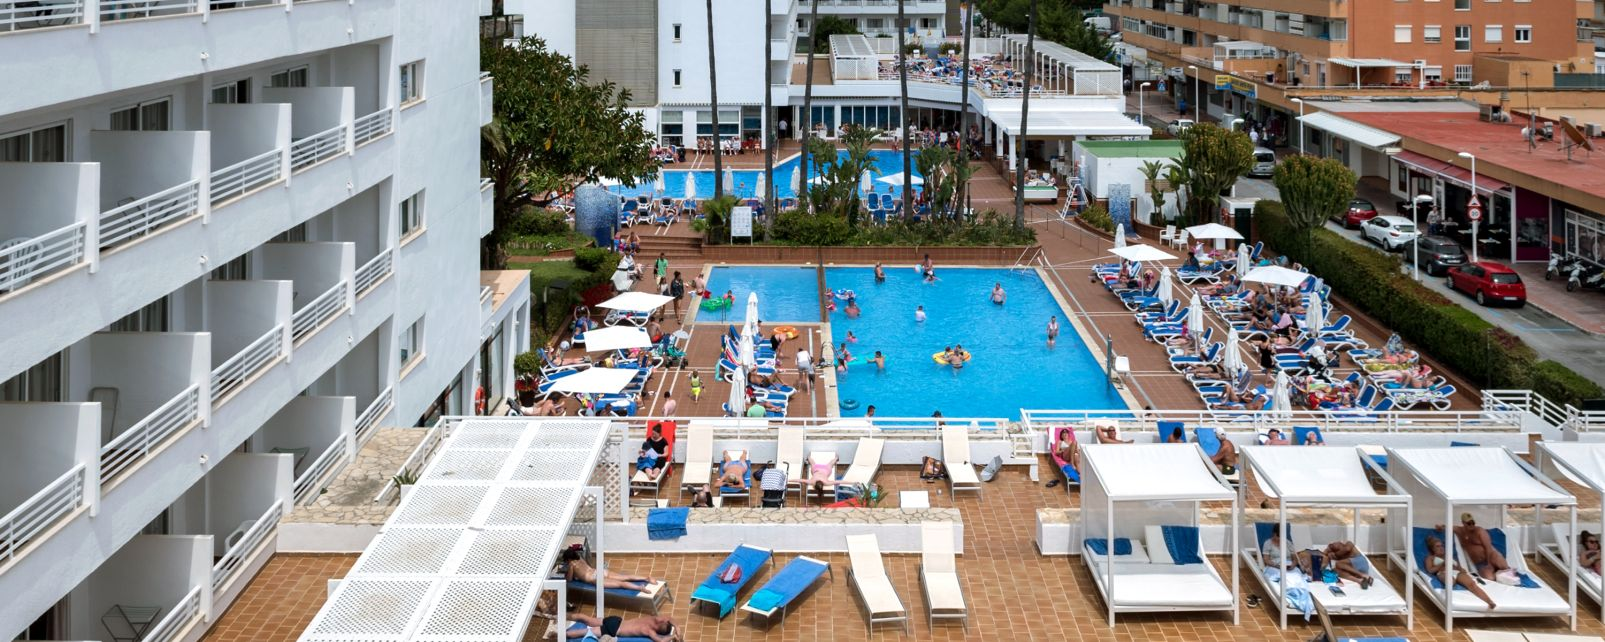 SuneoClub Globales Santa Ponsa Park